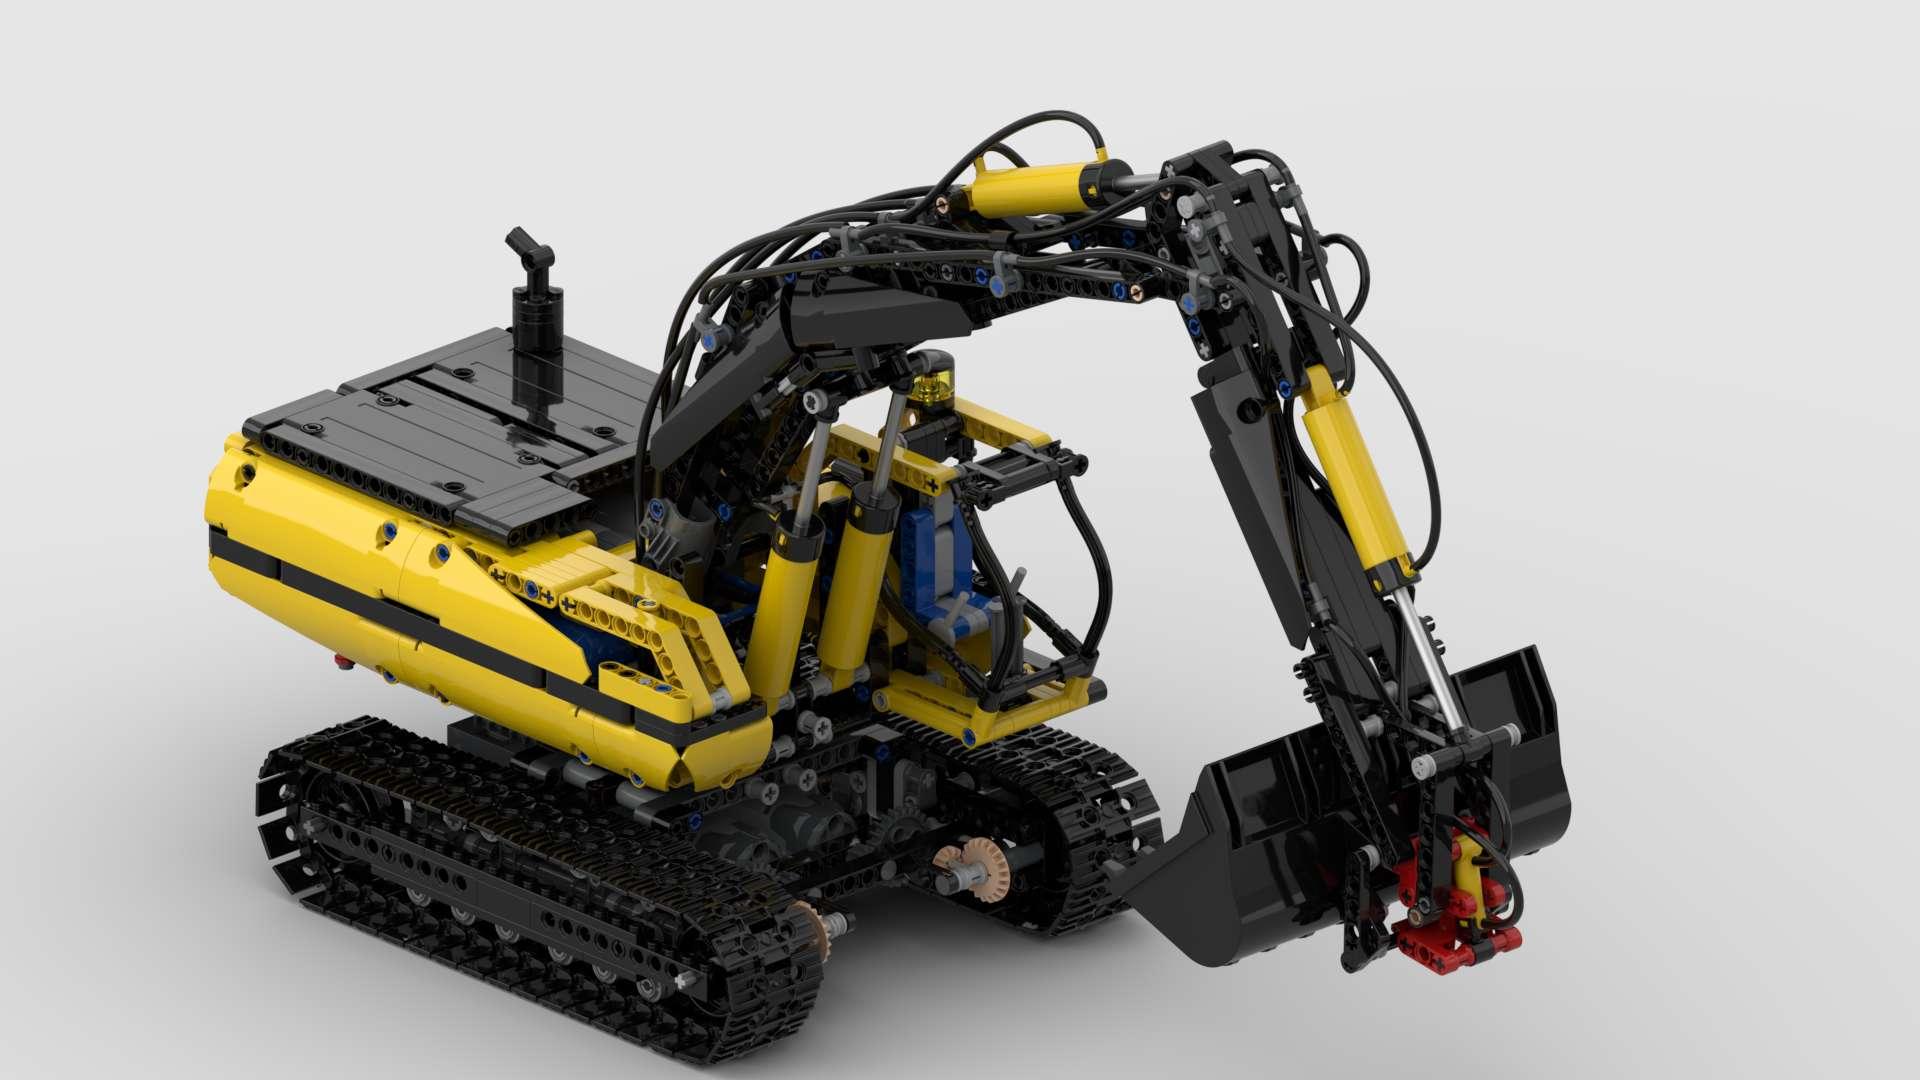 http://mistercreator.de/produkt/lego-8043-ultimate-pneumatik-bagger/